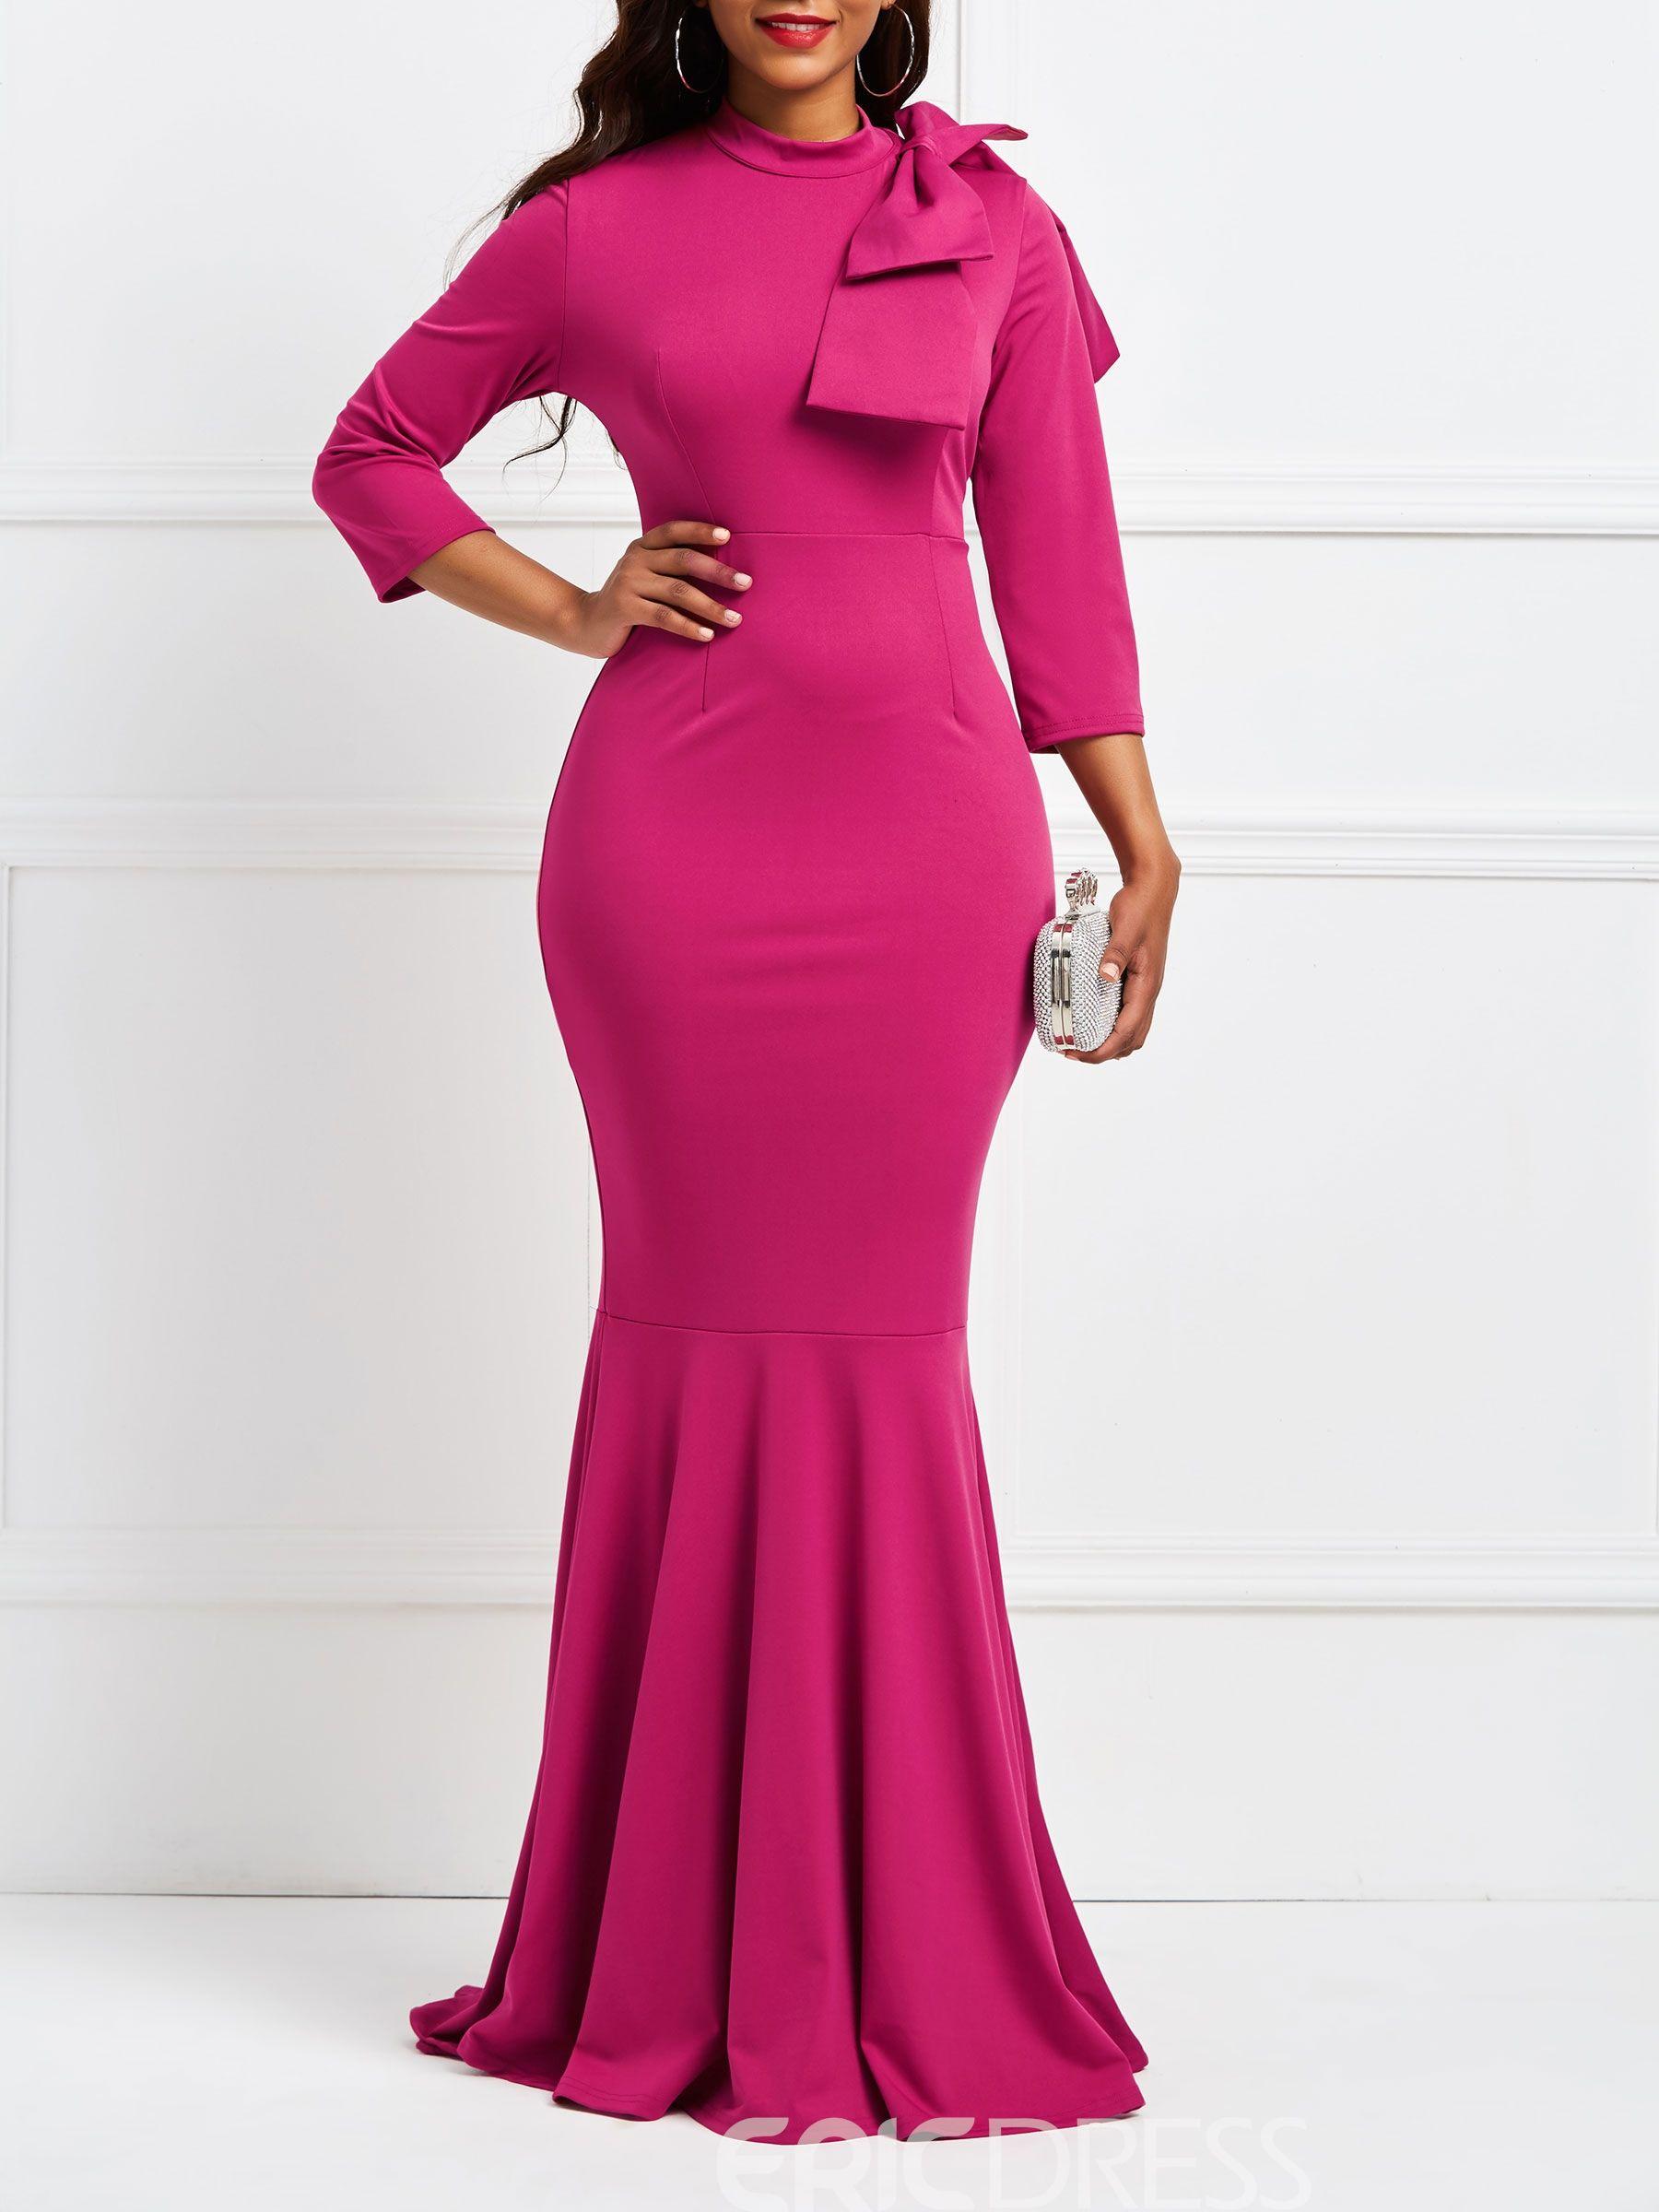 Ericdress purple sleeve bow bodycon maxi dress wedding guest